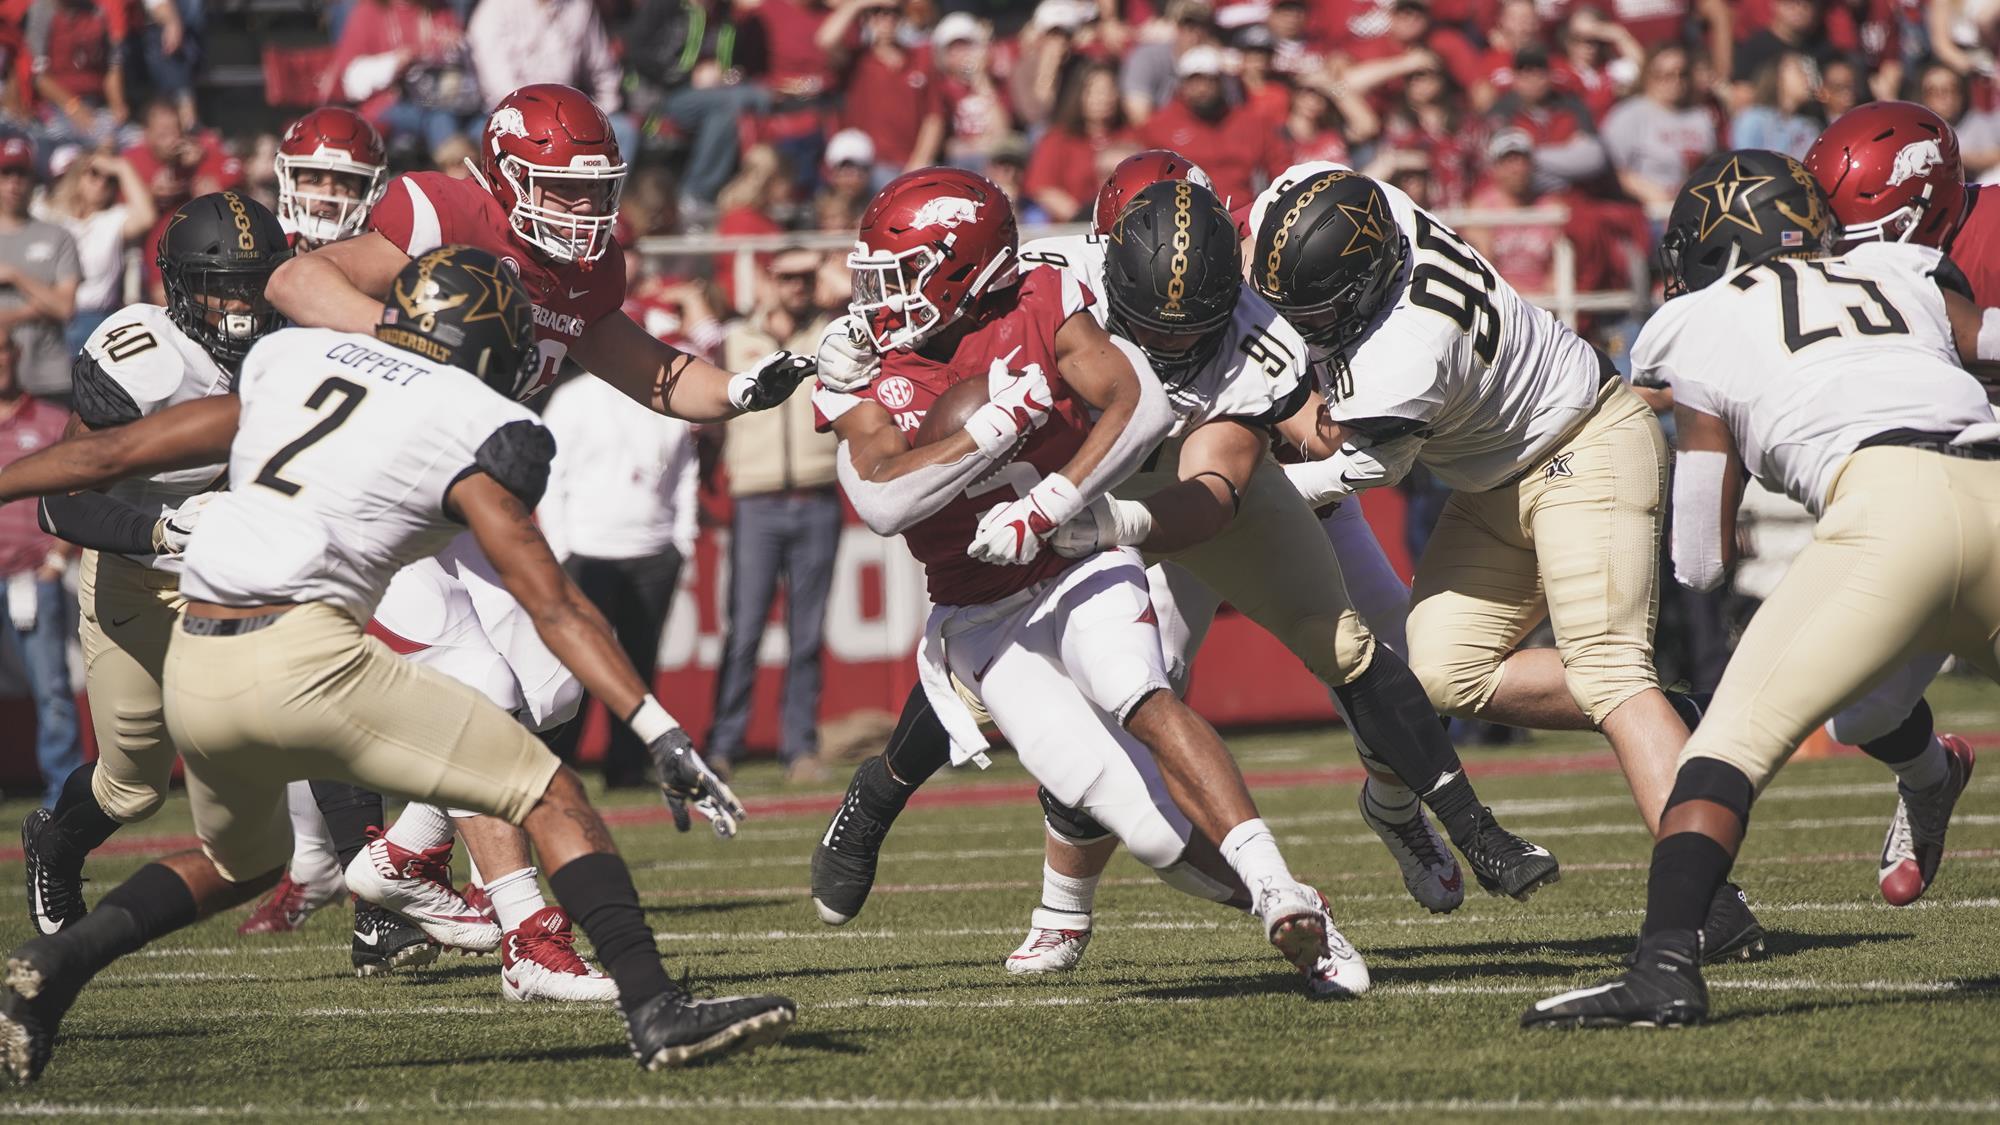 Drew Birchmeier - Football - Vanderbilt University Athletics 7d2d6b870